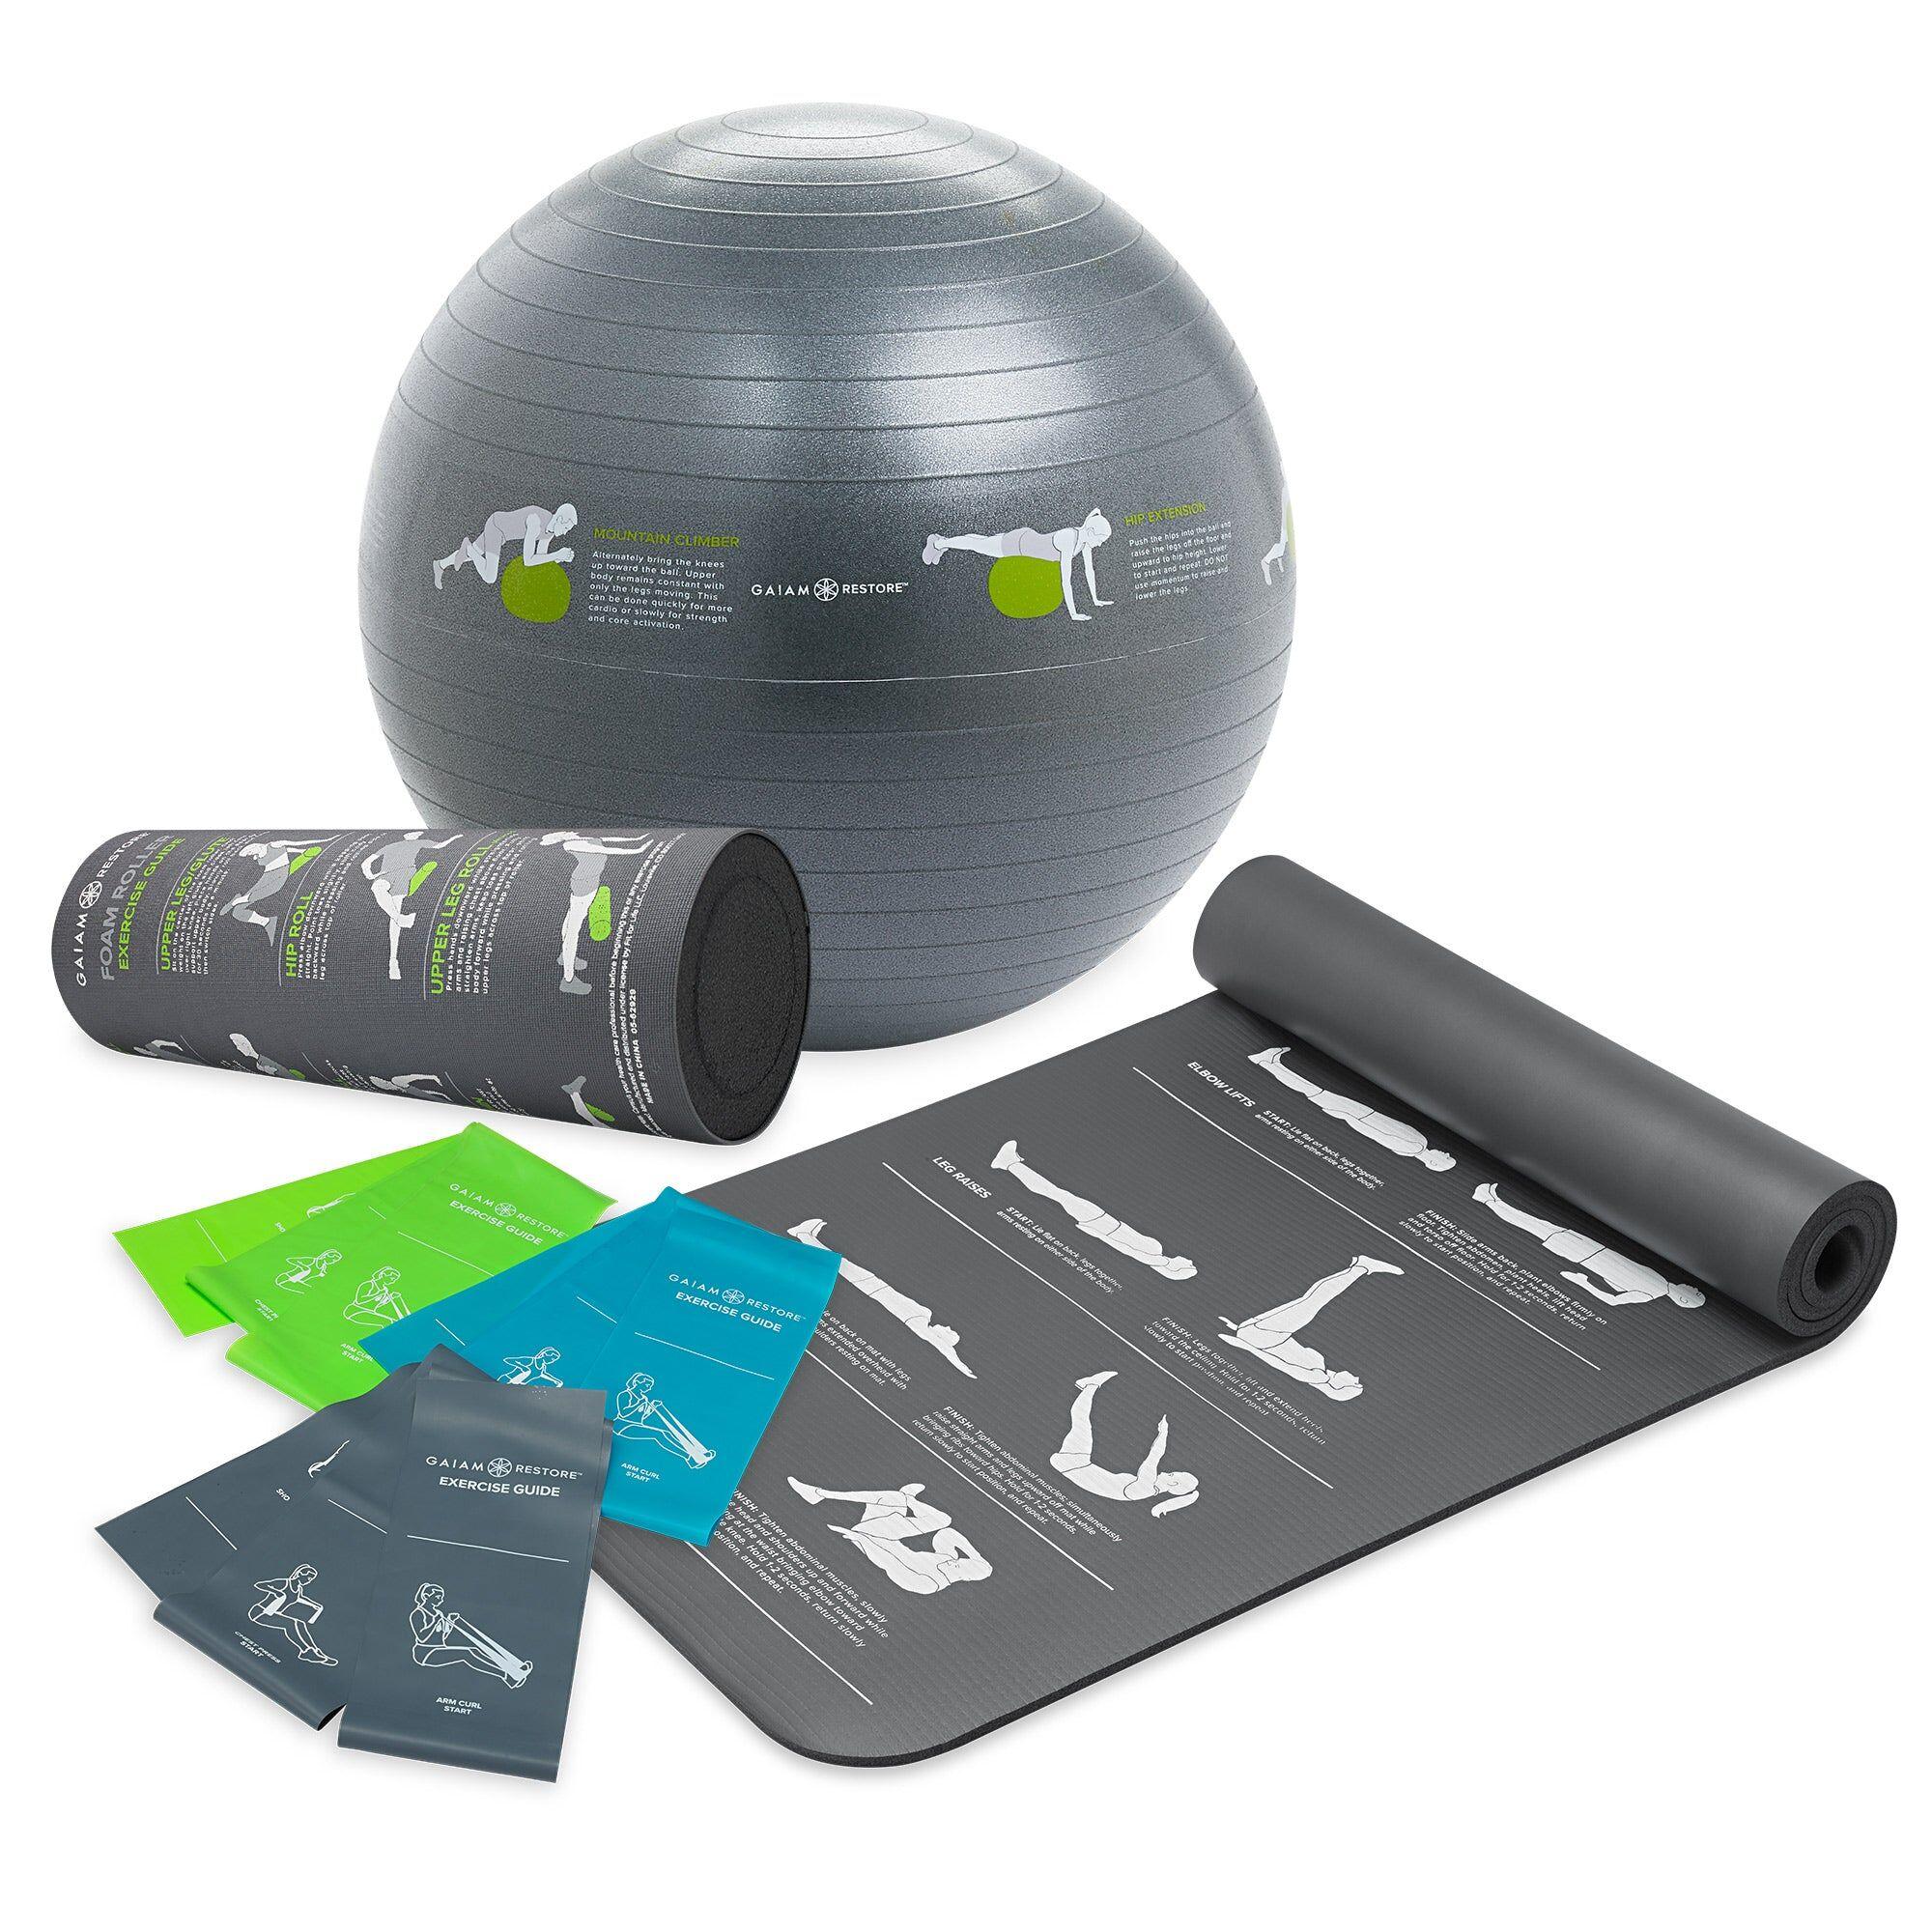 Gaiam Self-Guided Fitness Kit  - mult